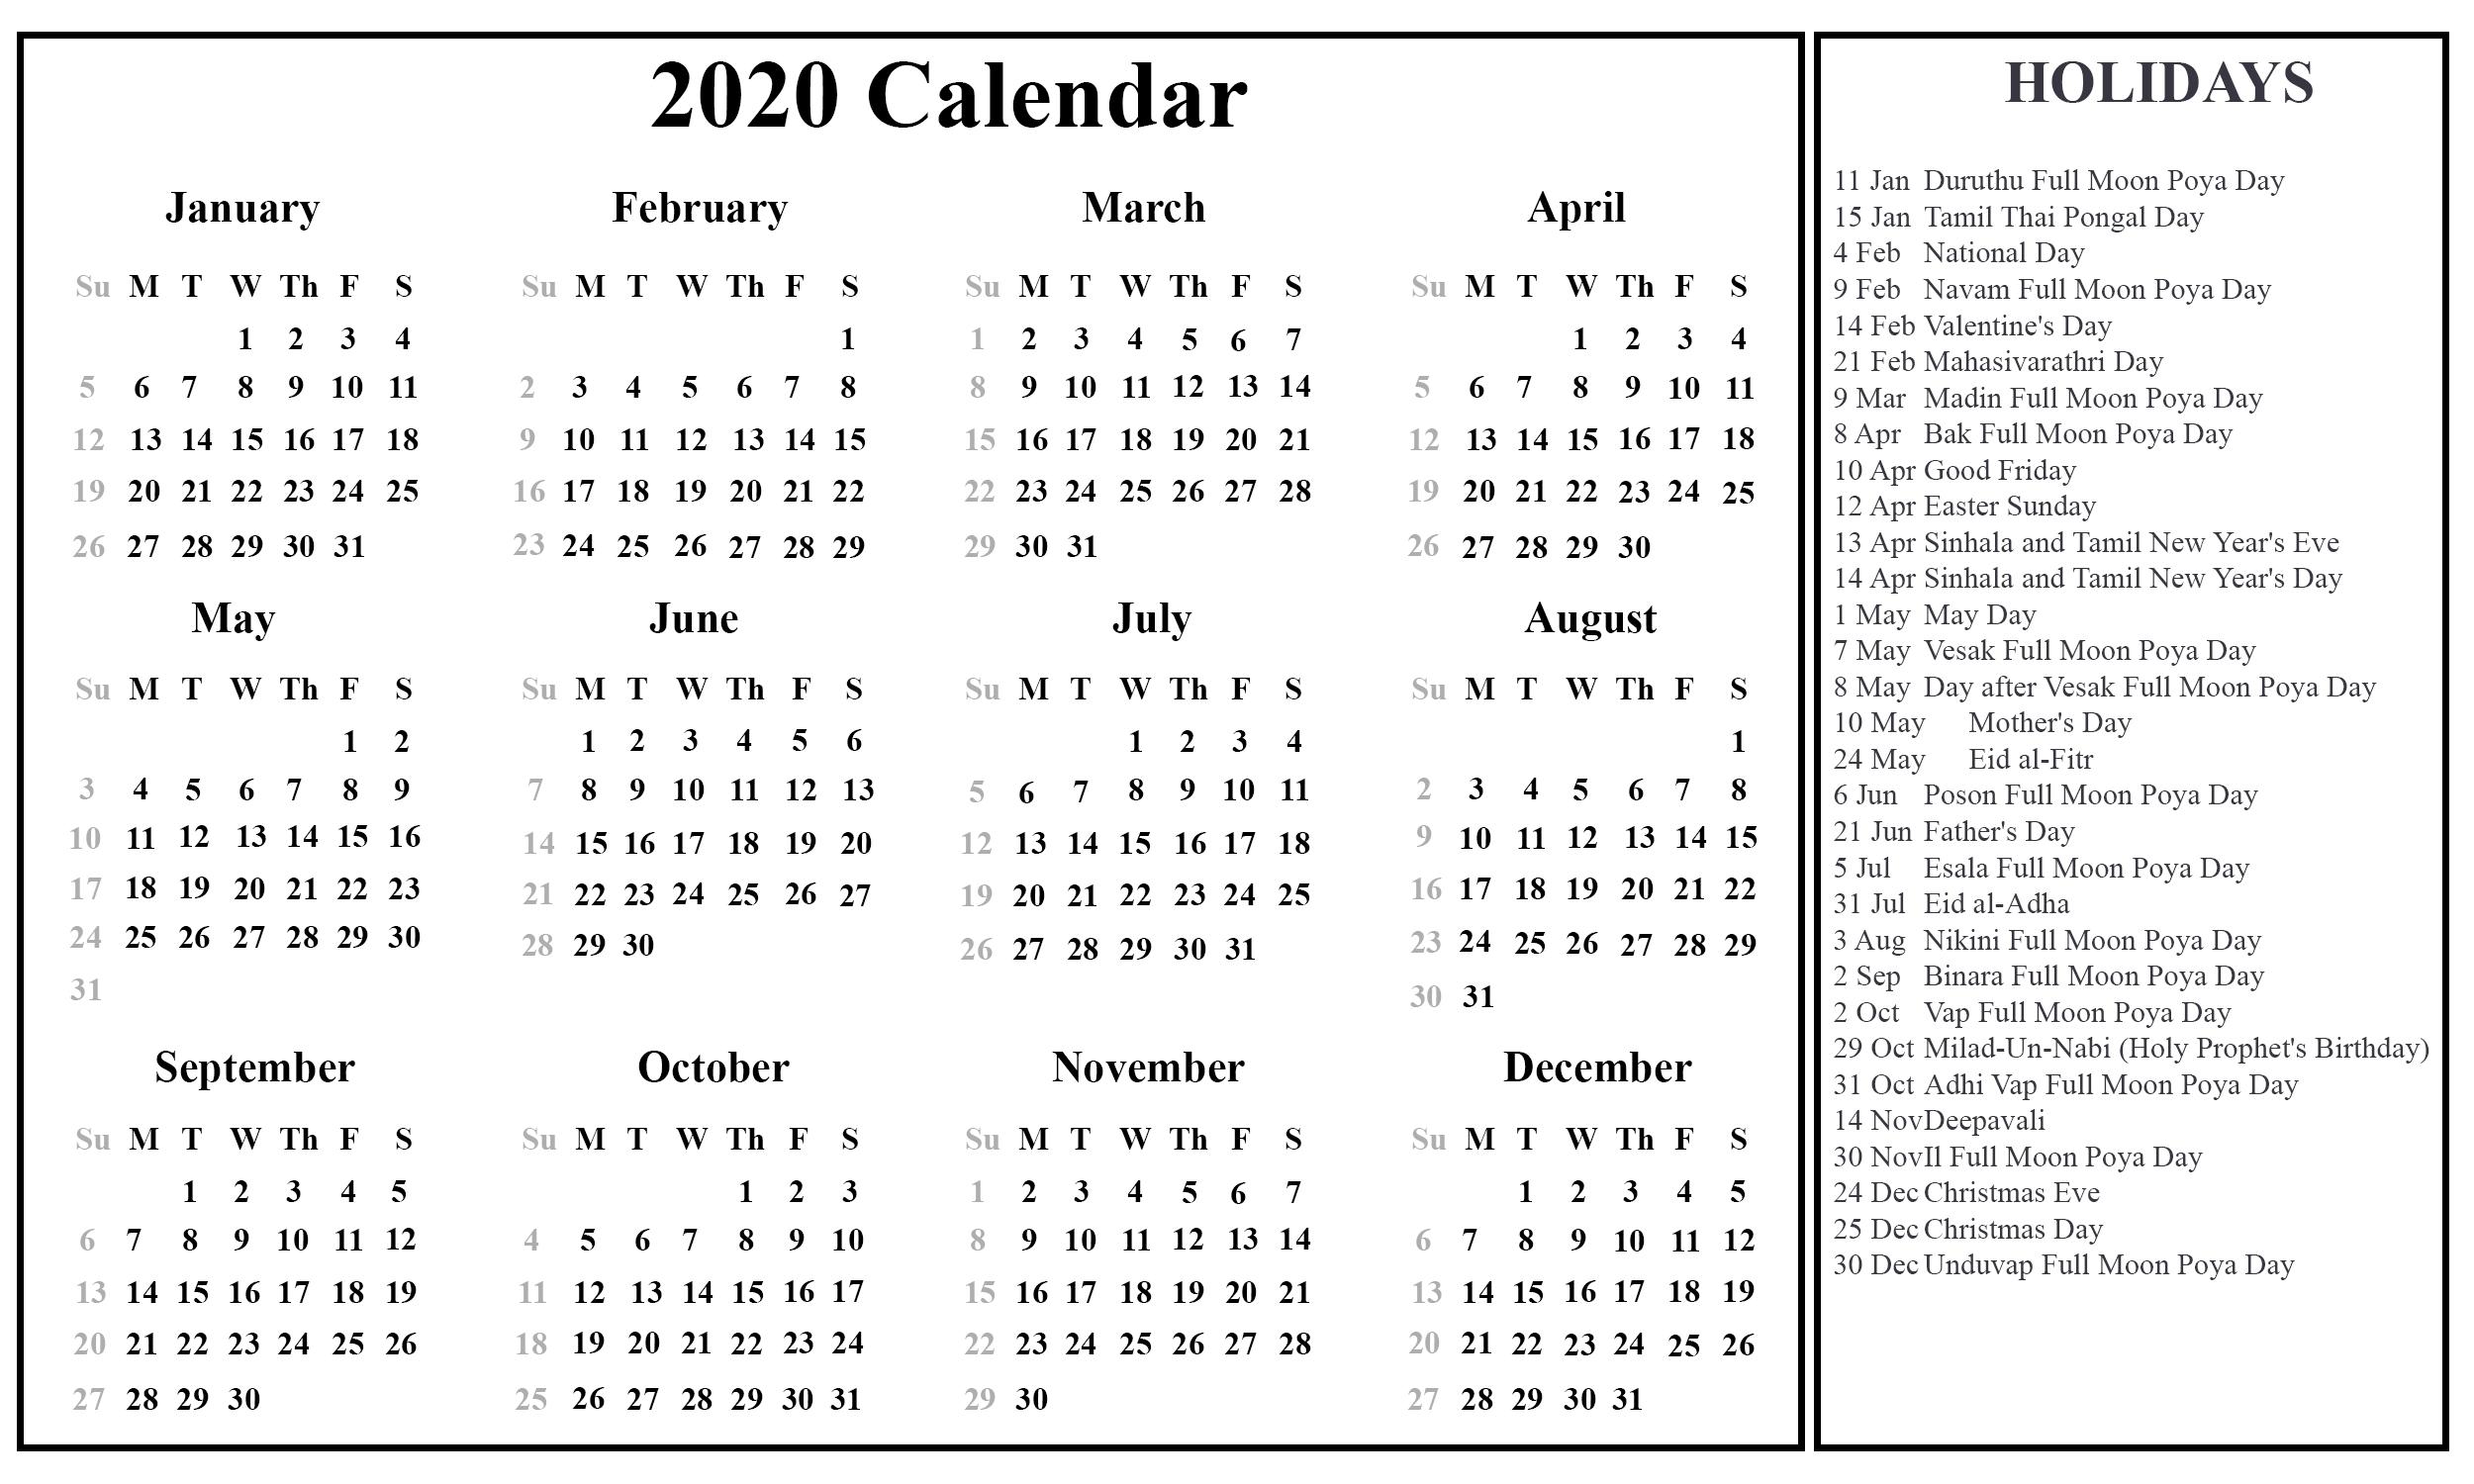 Printable Free Download Sri Lanka Calendar 2020 [Pdf, Excel-2020 Calendar With Holidays